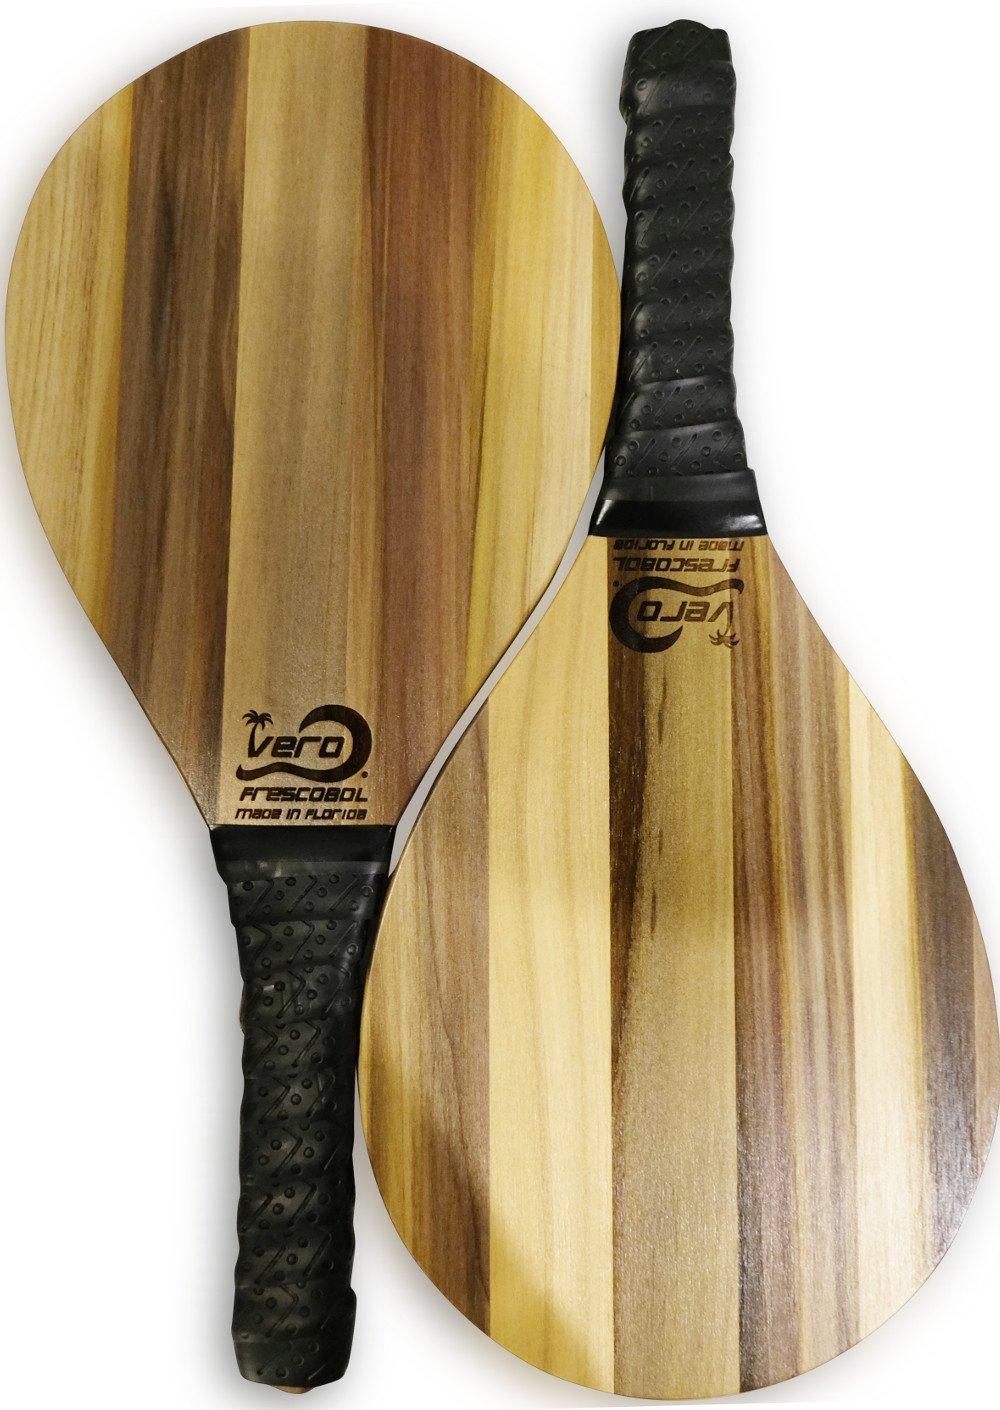 Vero Frescobol Exotic Purple Popular Solid Wood Frescobol Beach Paddles, Official Ball, Beach Tote-bag, USA